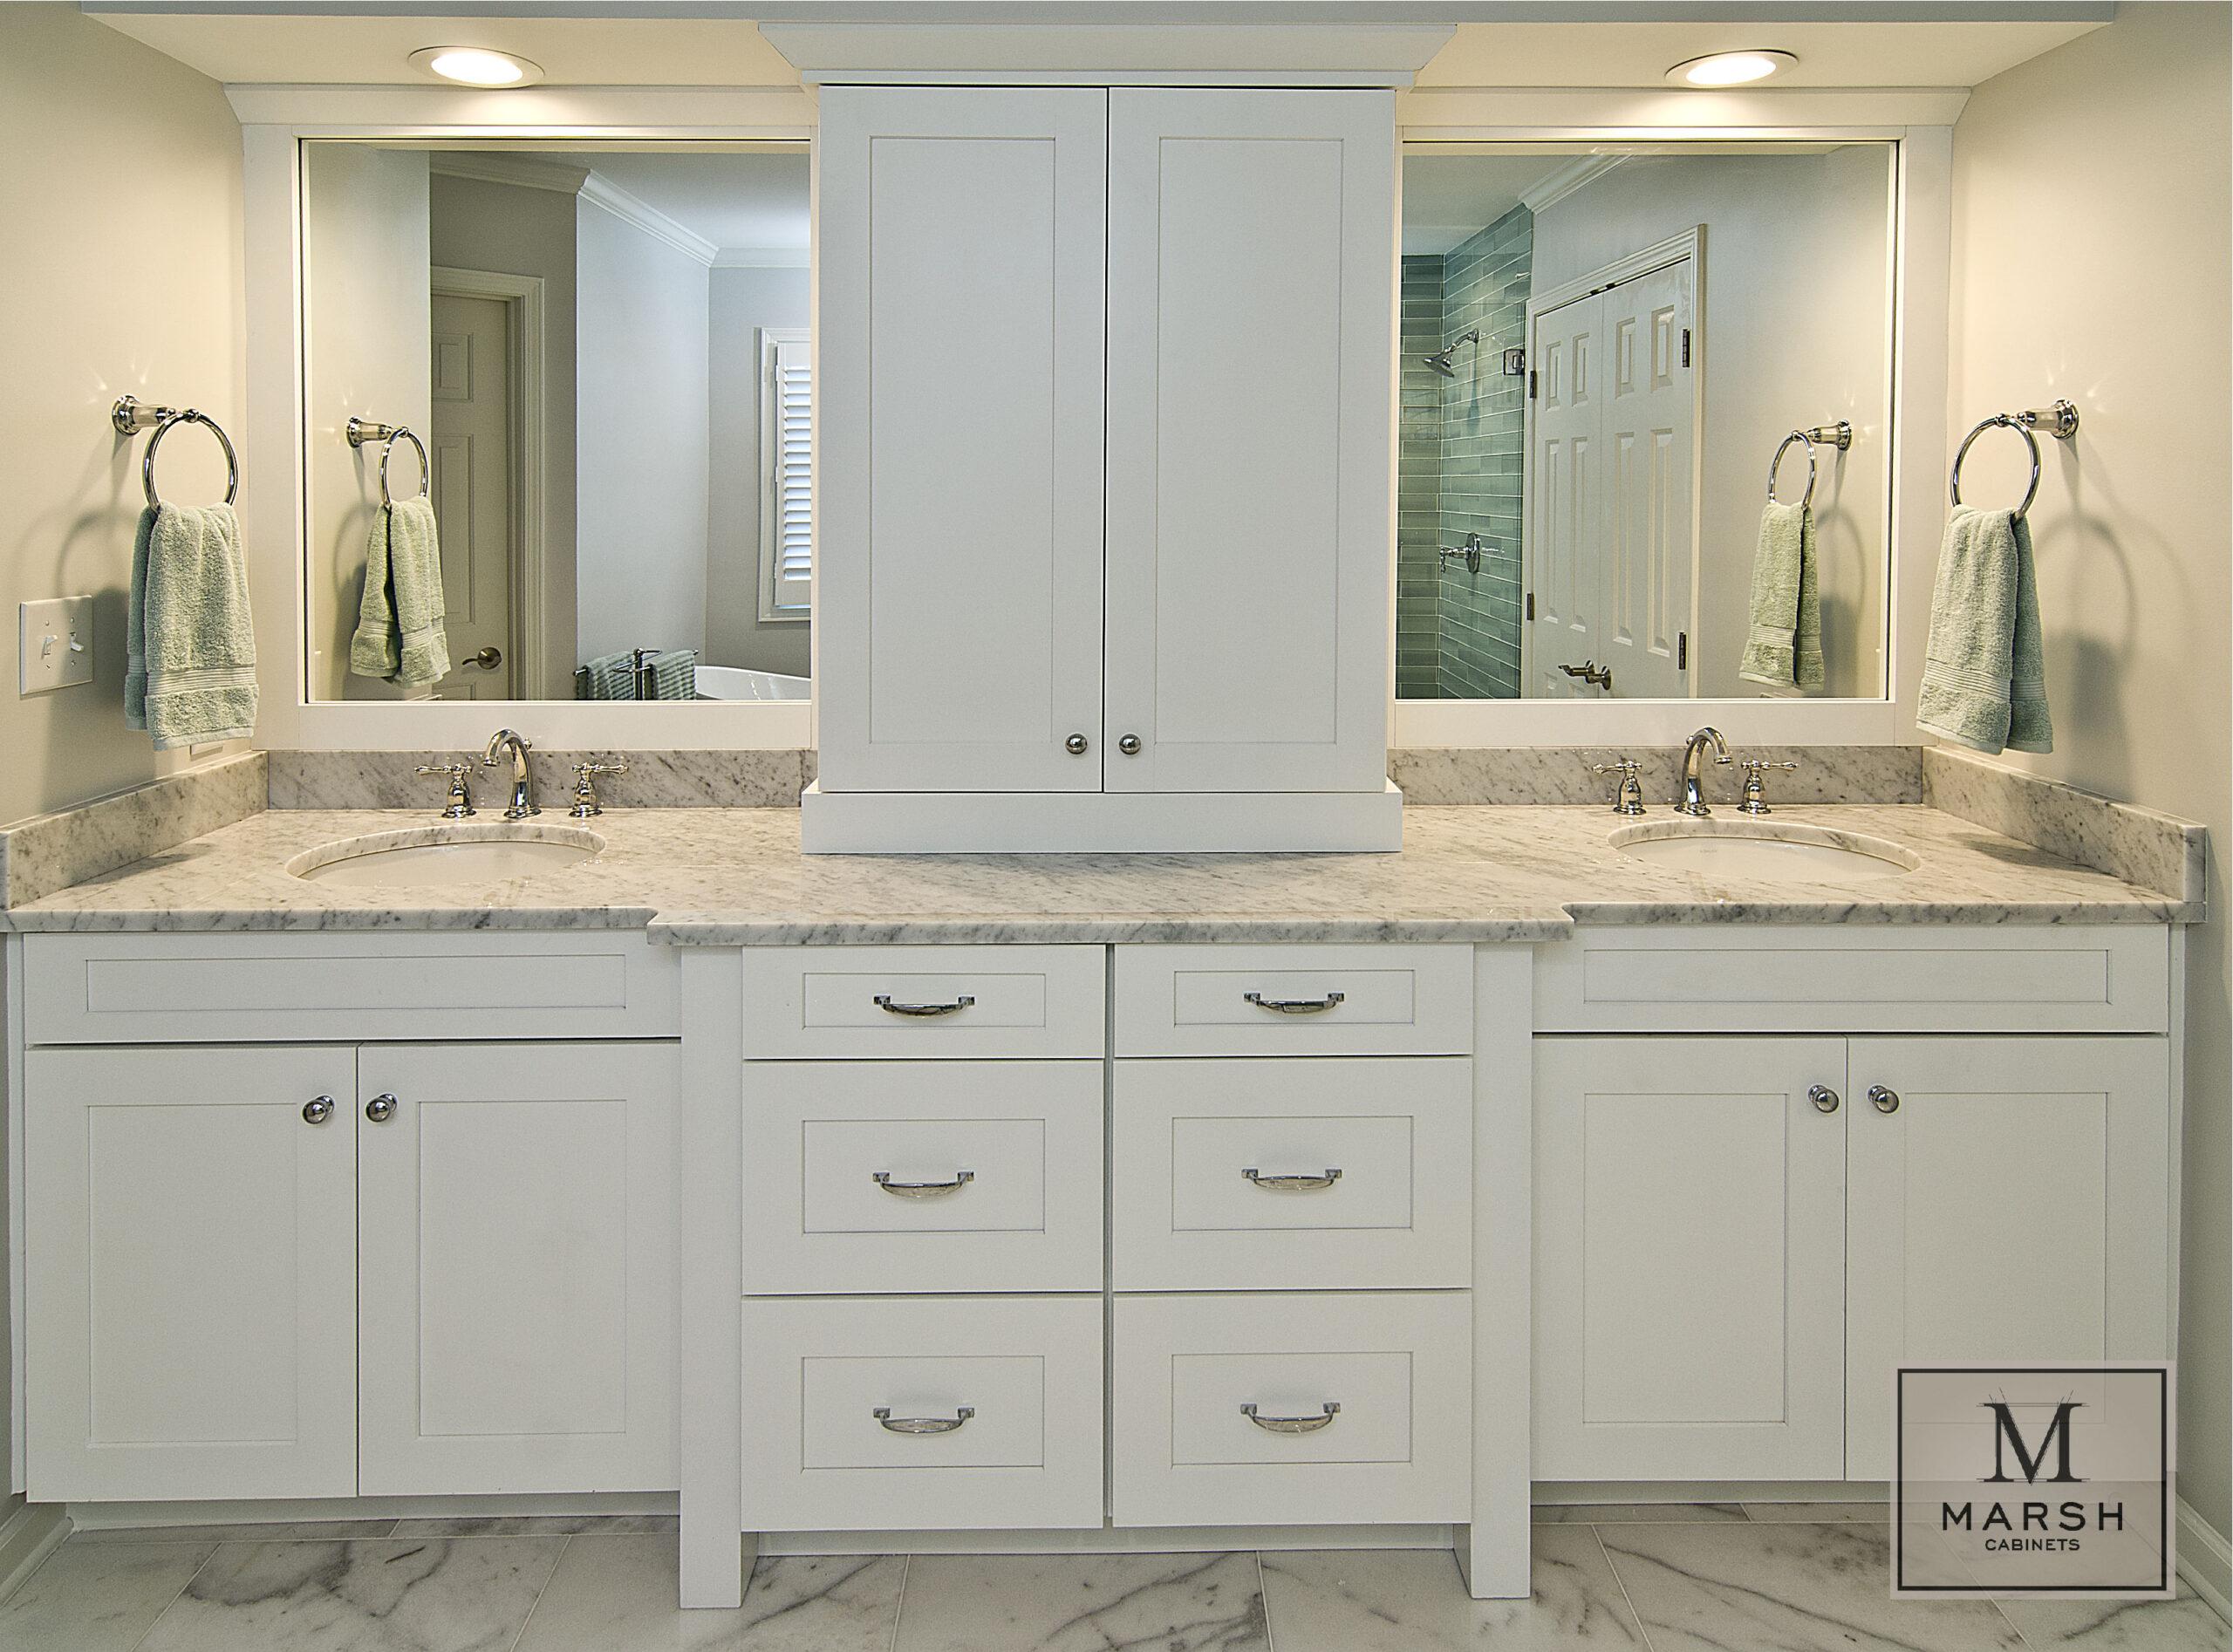 Kitchen Cabinets Raleigh Modern Summerfield Alpine White Paint Shaker Tower Mirrors Granite Vanity